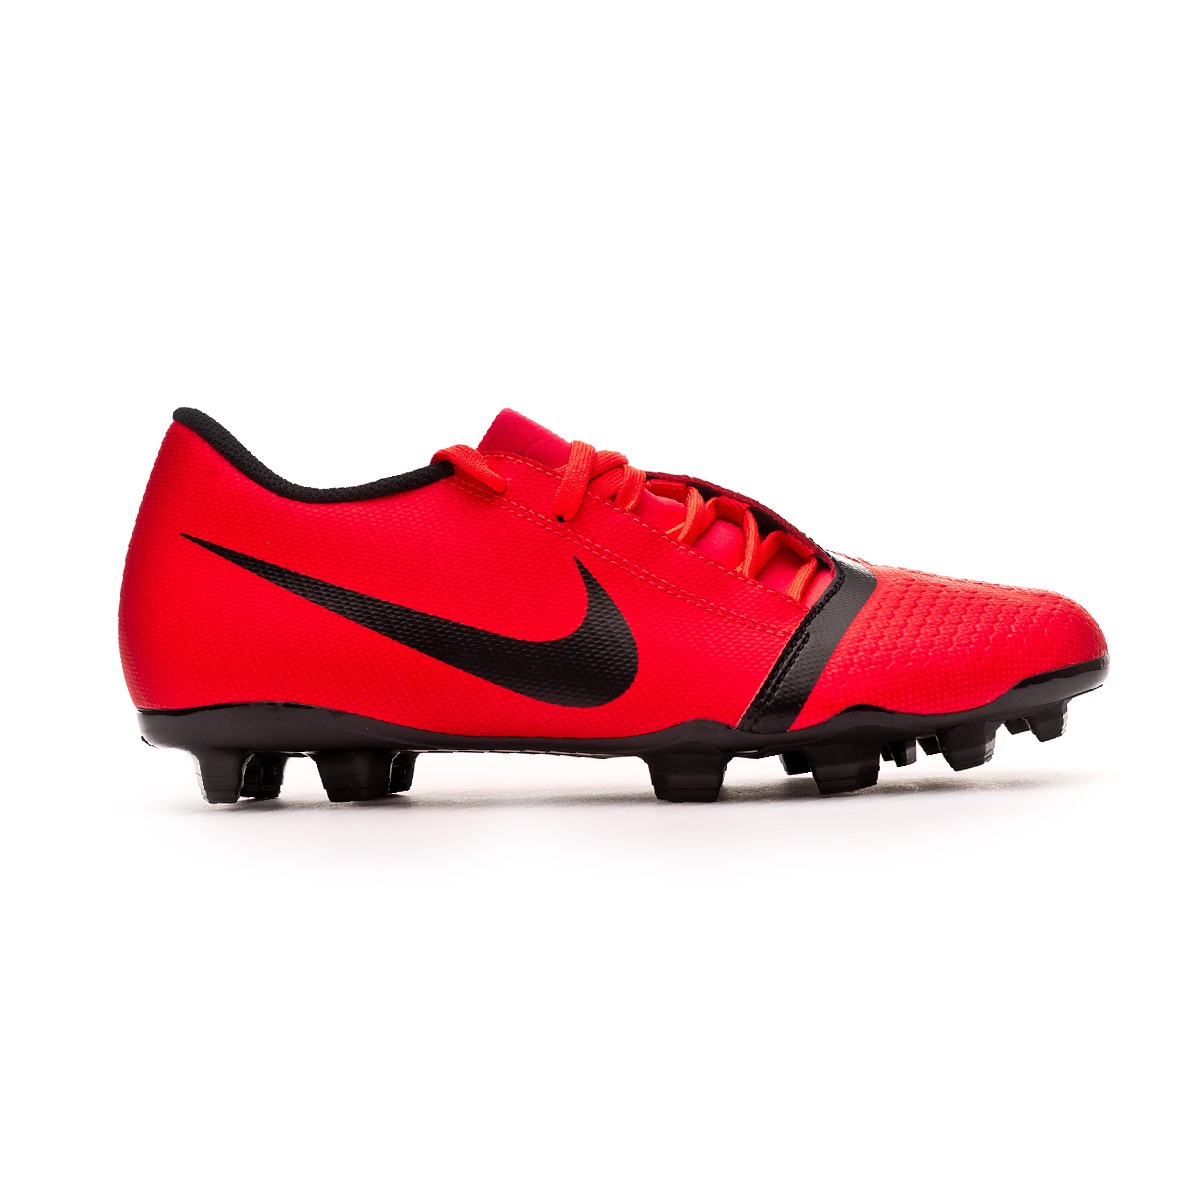 the latest 8ebe6 7bbd3 Chaussure de foot Nike Phantom Venom Club FG Bright crimson-Black -  Boutique de football Fútbol Emotion